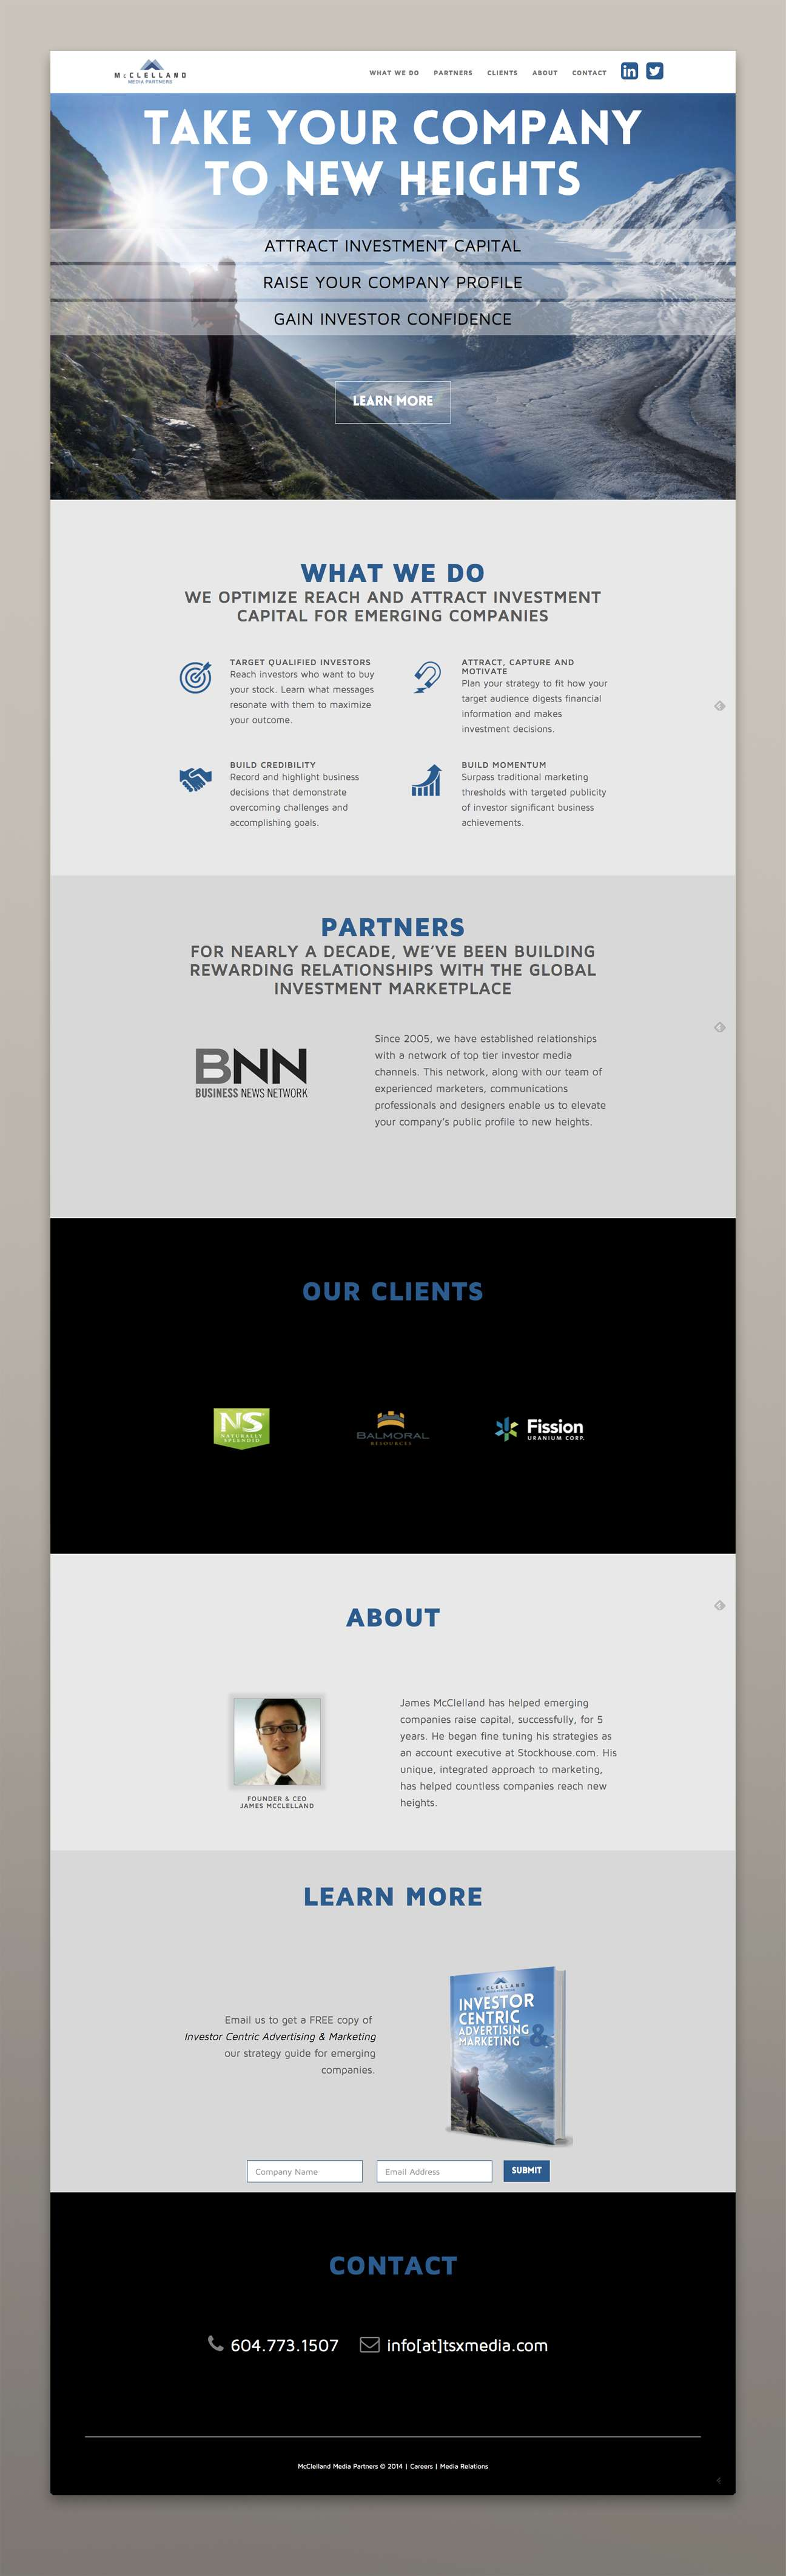 McClelland Media Partners